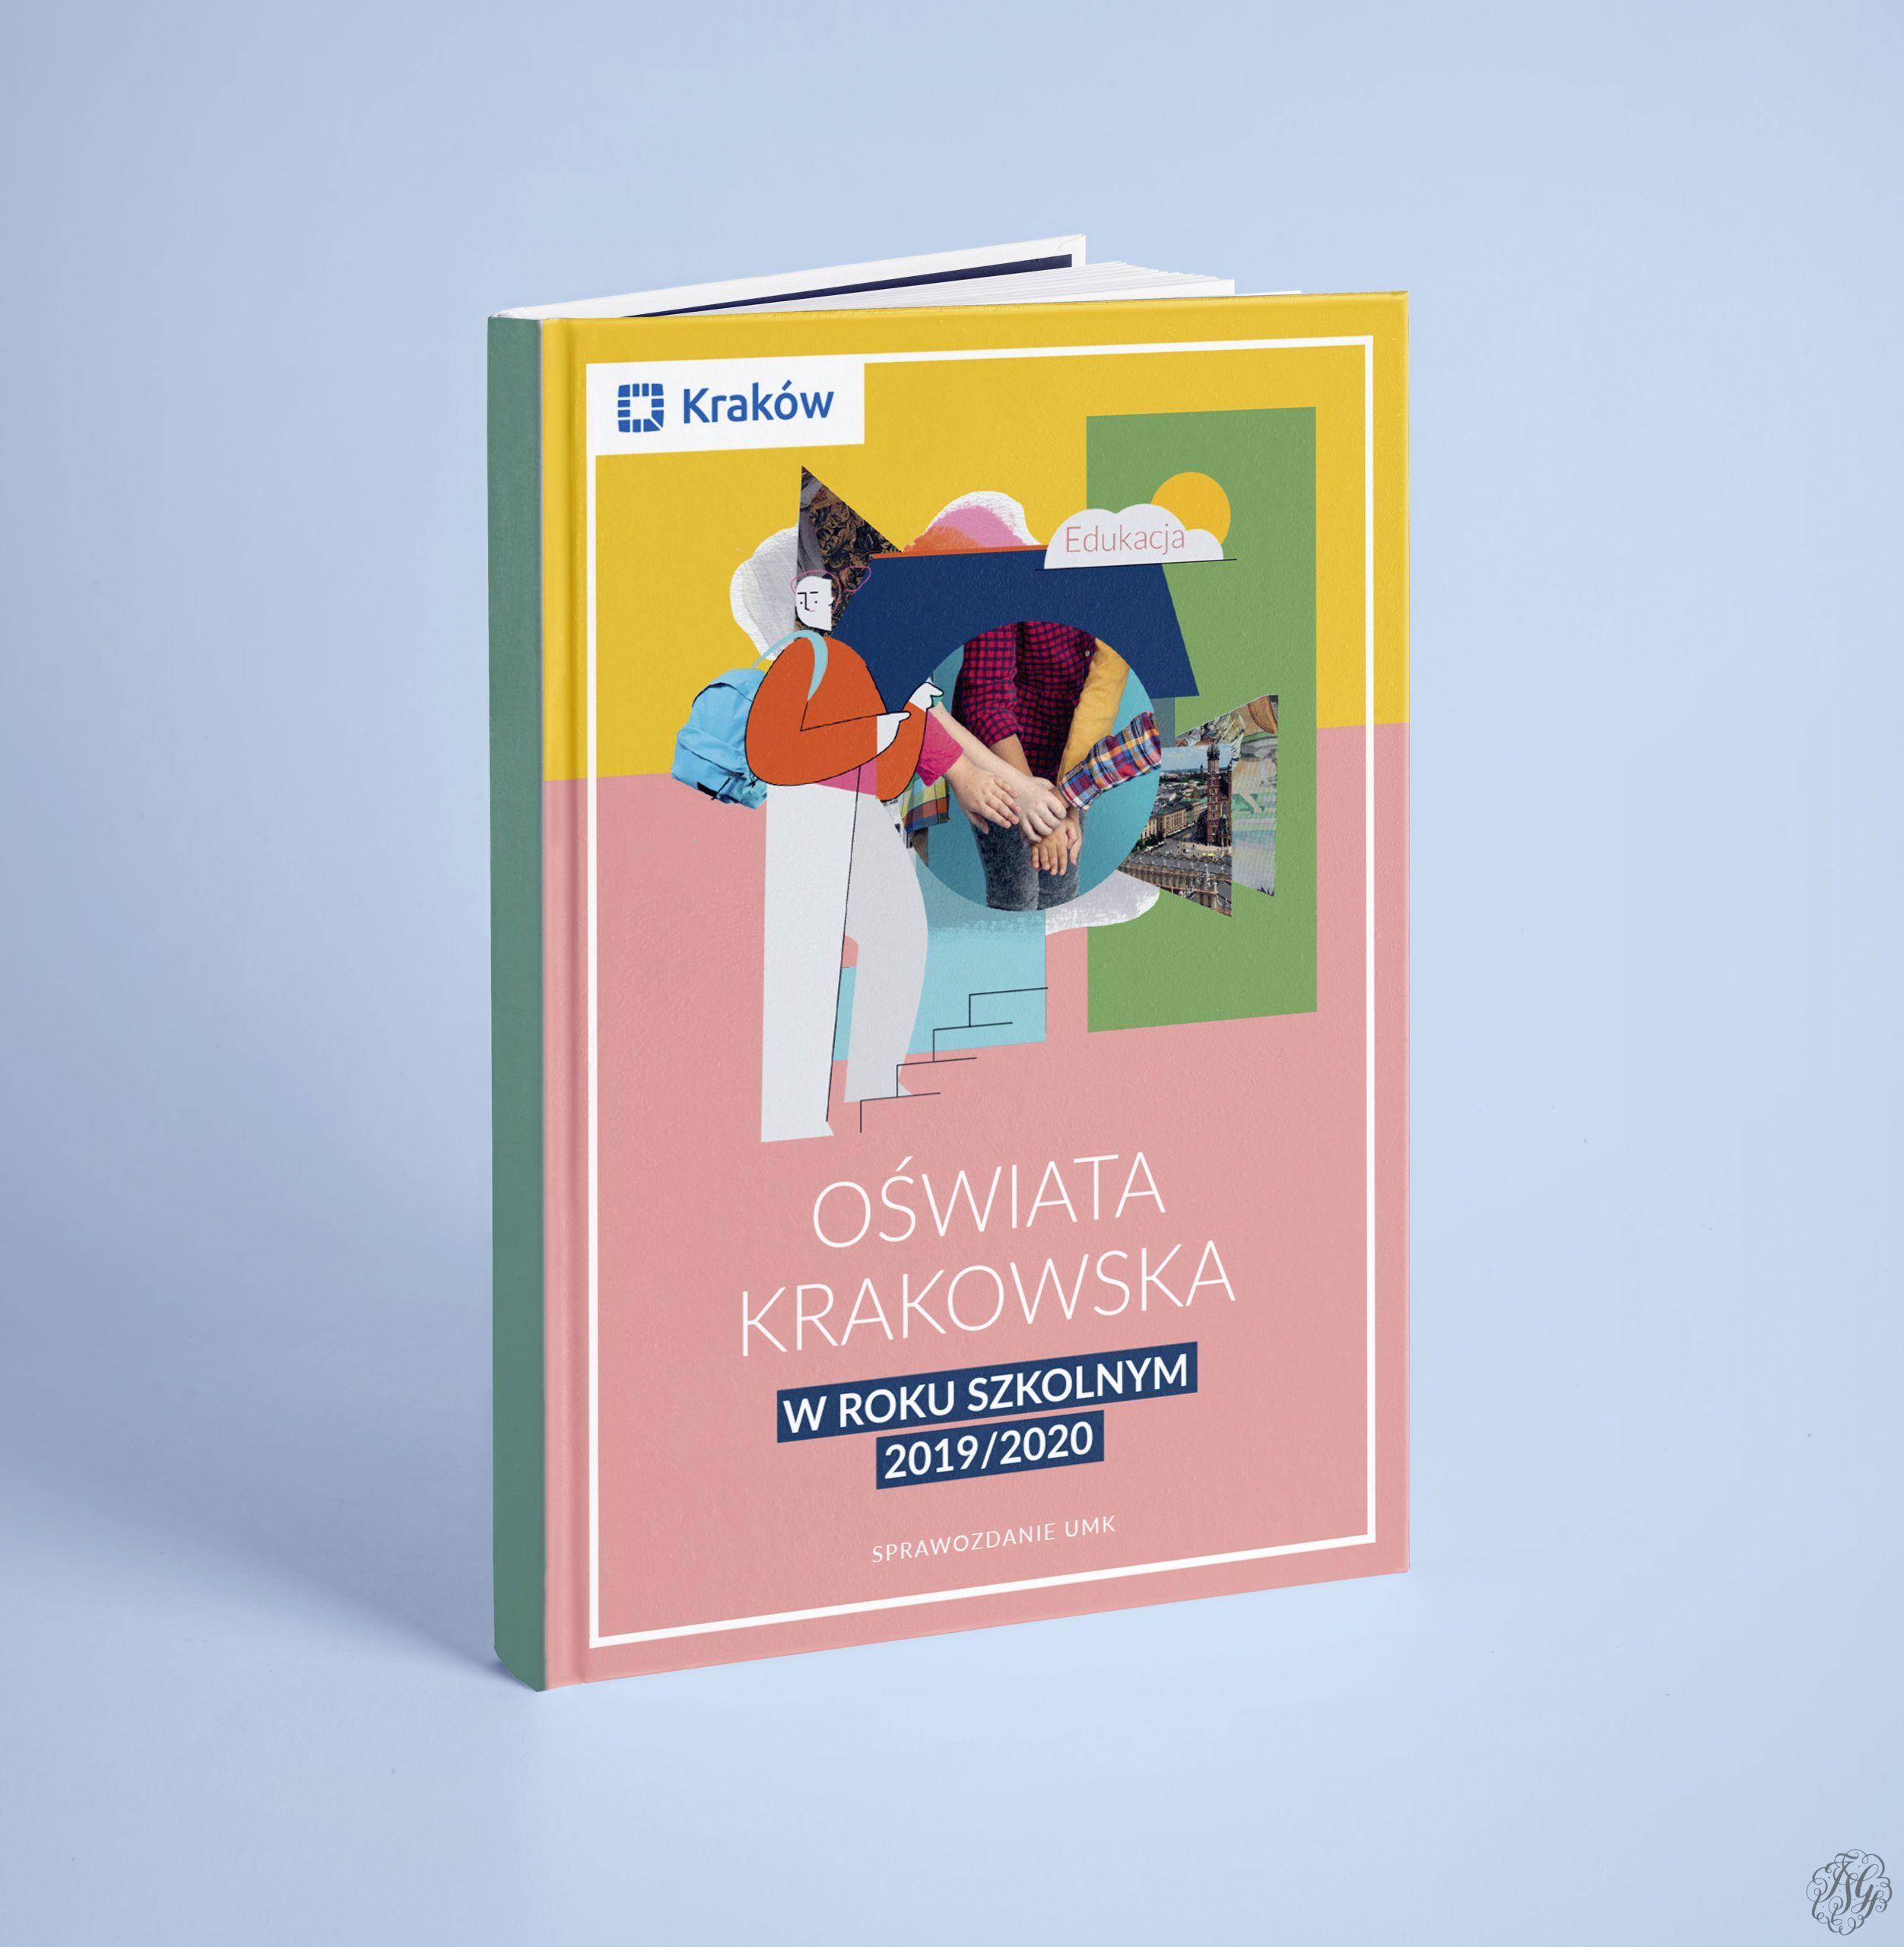 Oświata Krakowska 2019/2020